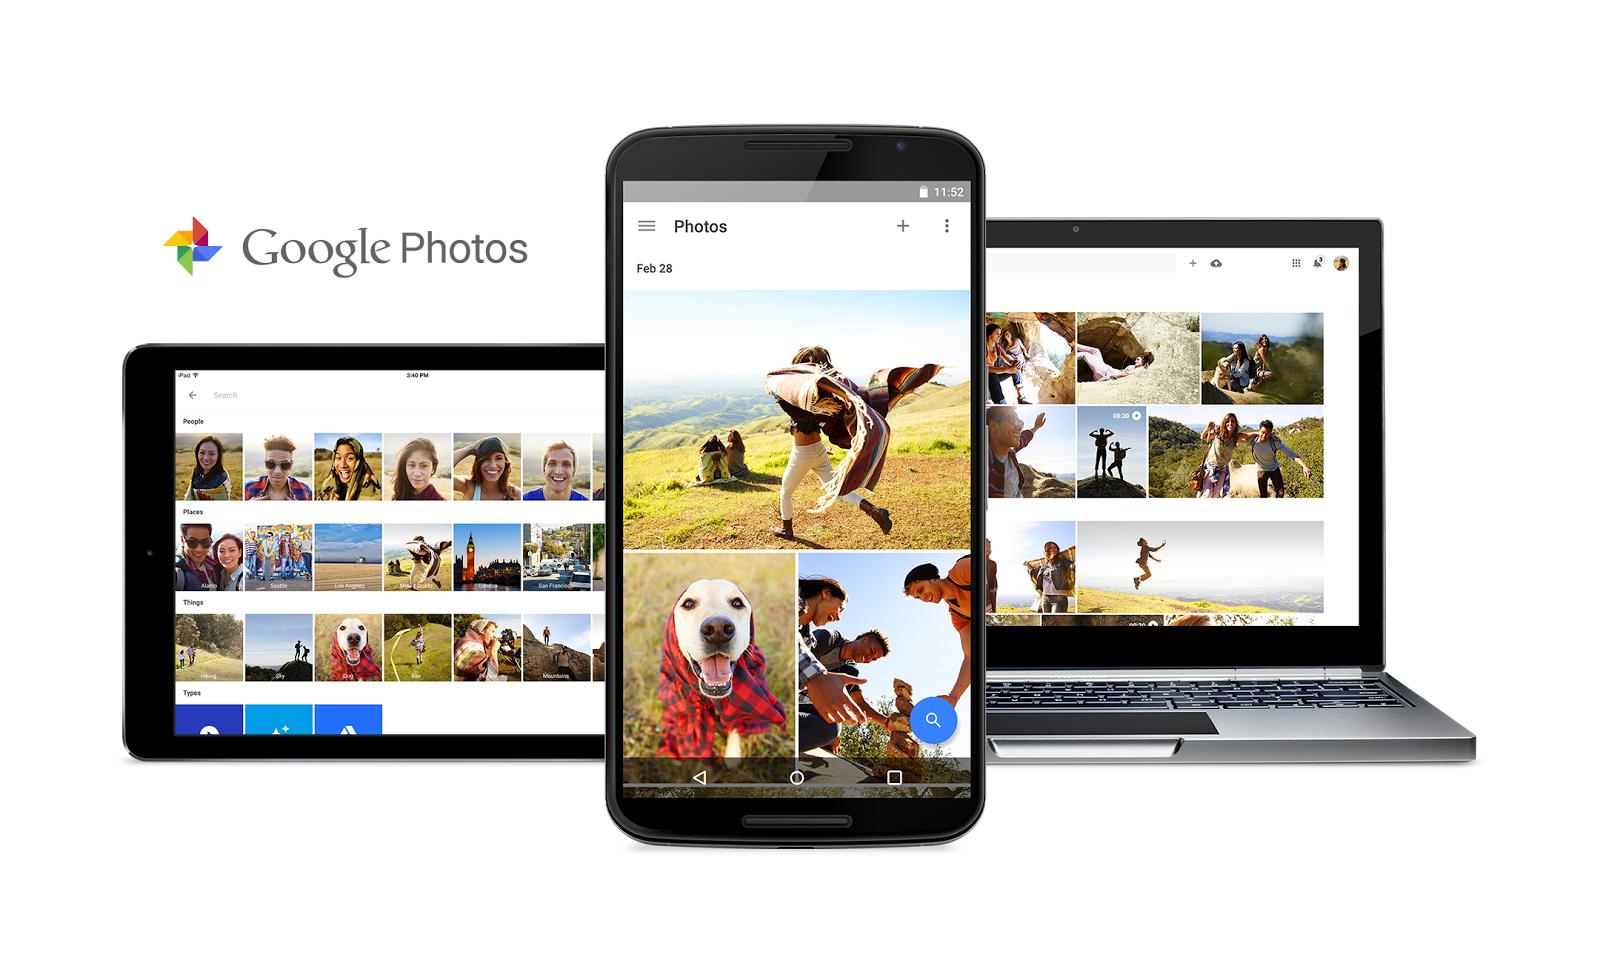 Google Photos gets smarter. Image Courtesy: Google Photos